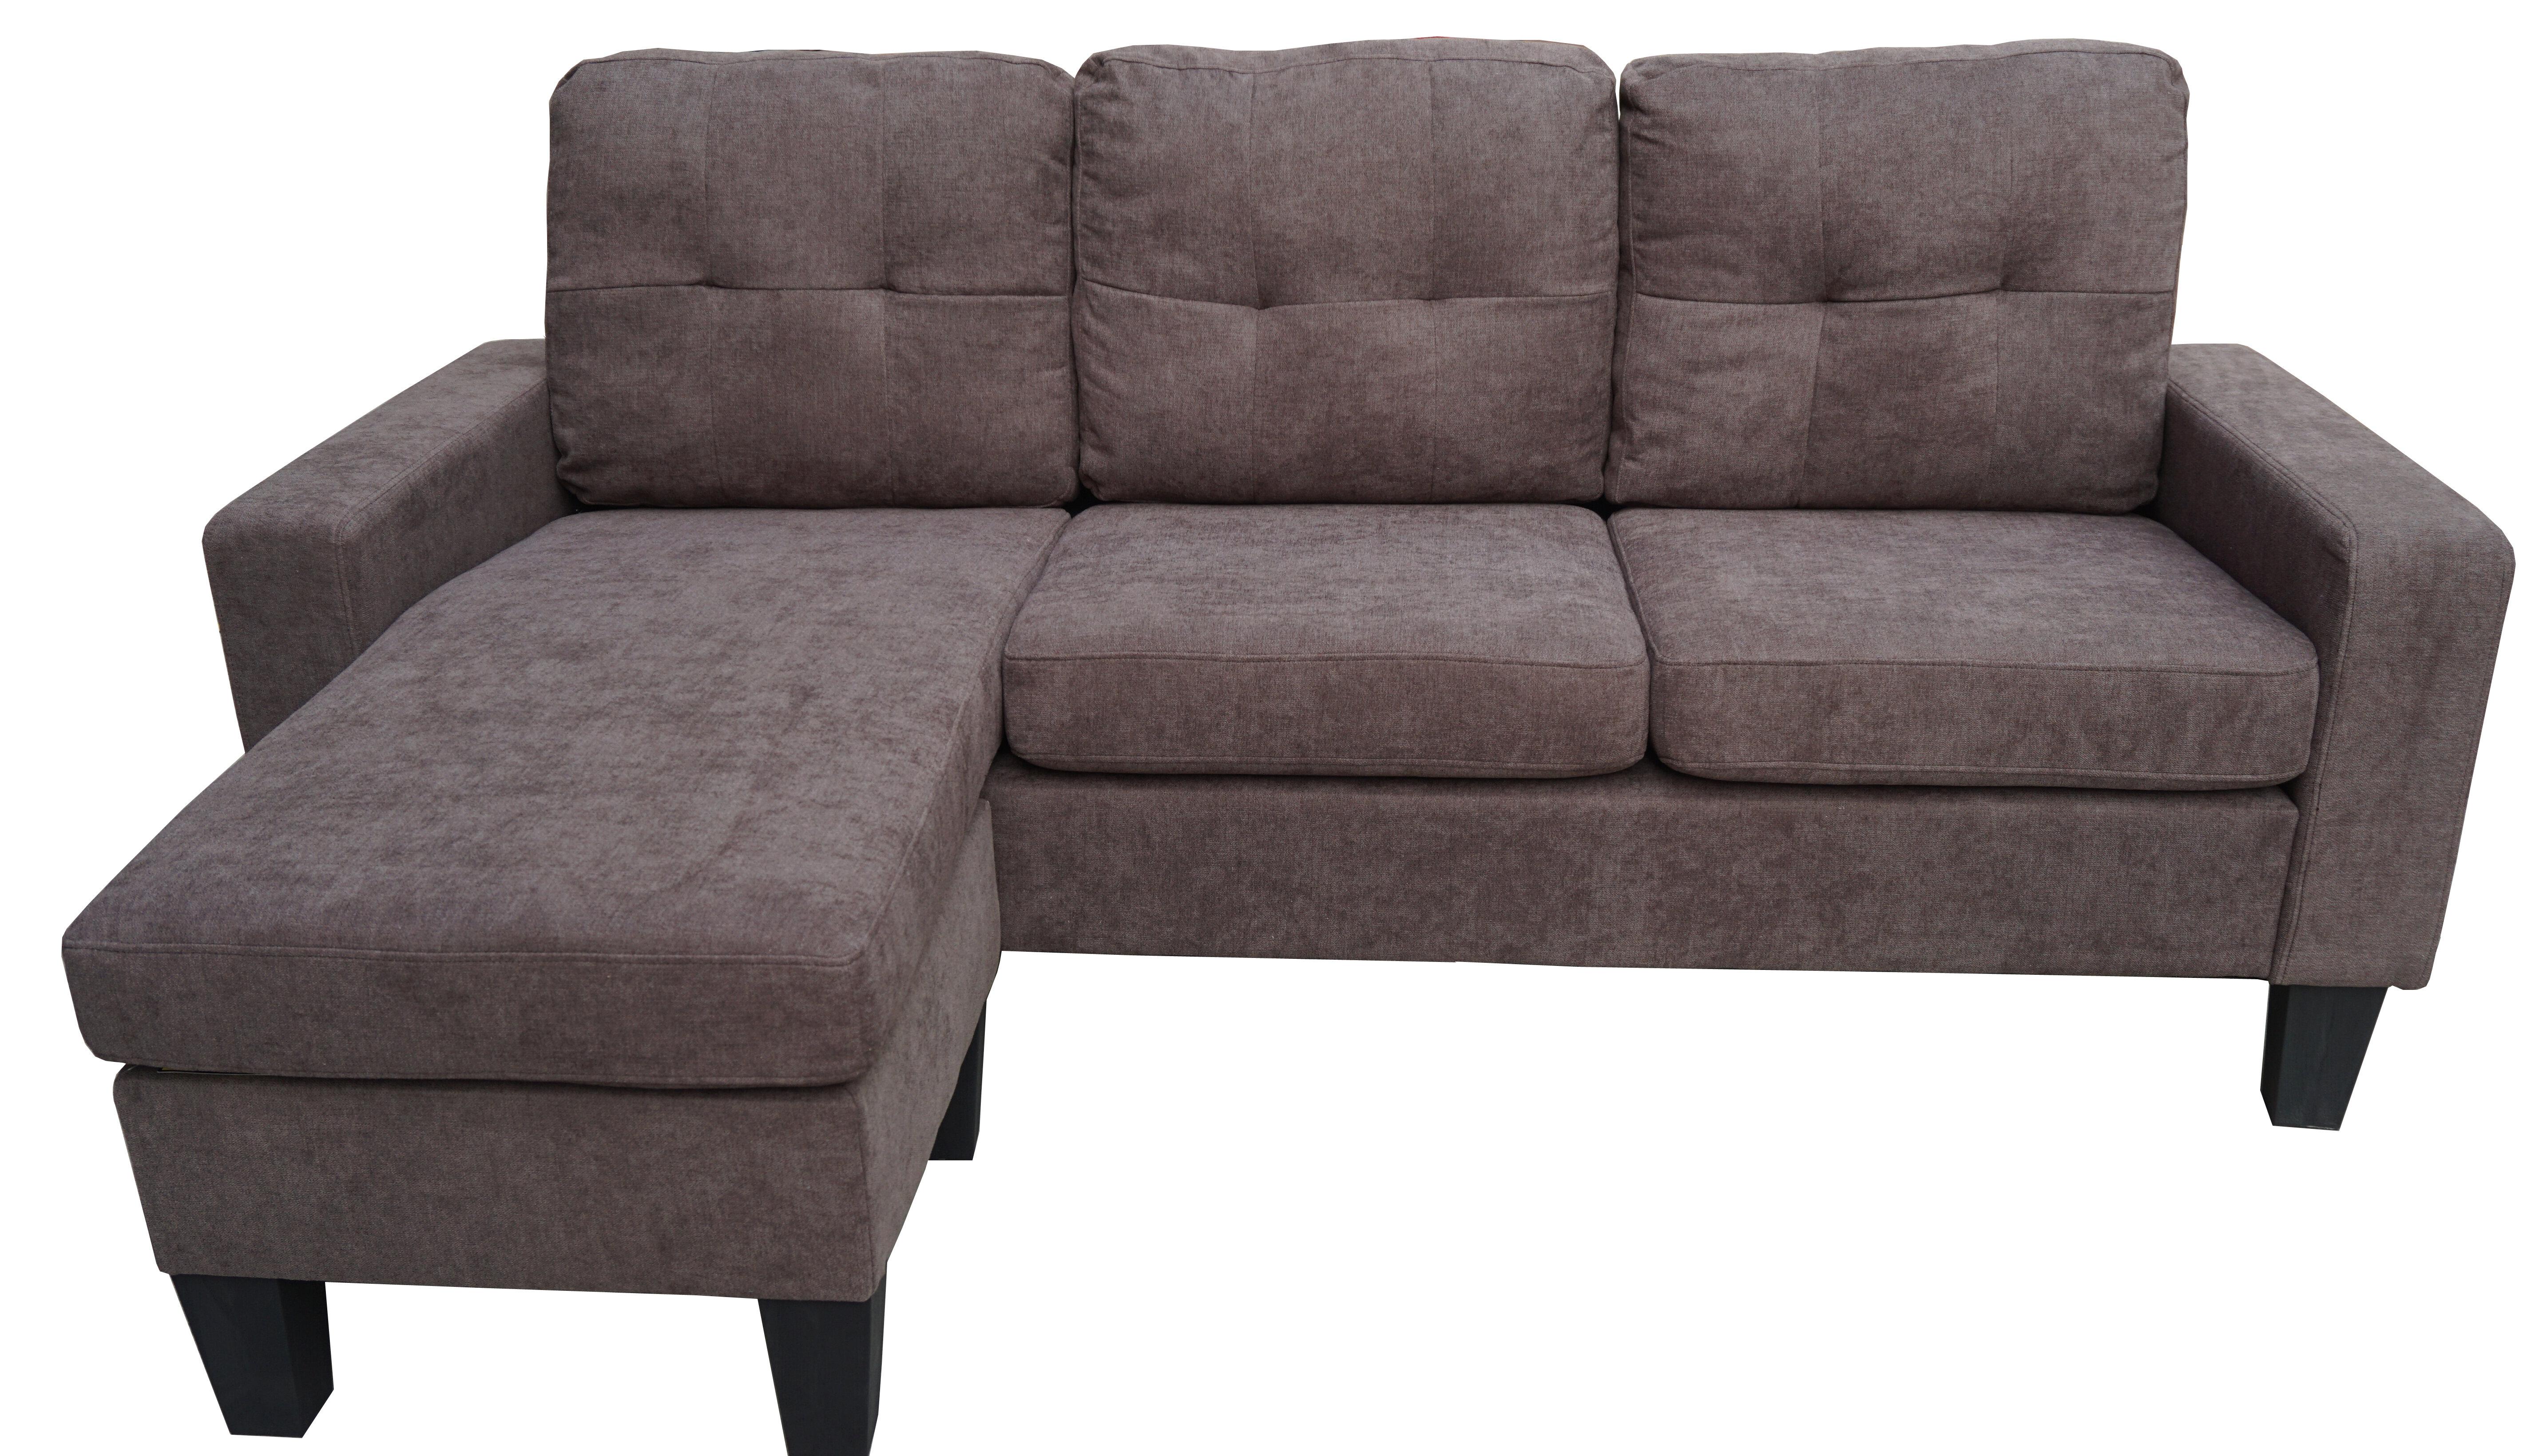 Marvelous Stlouis Movable Ottoman Sofa Inzonedesignstudio Interior Chair Design Inzonedesignstudiocom